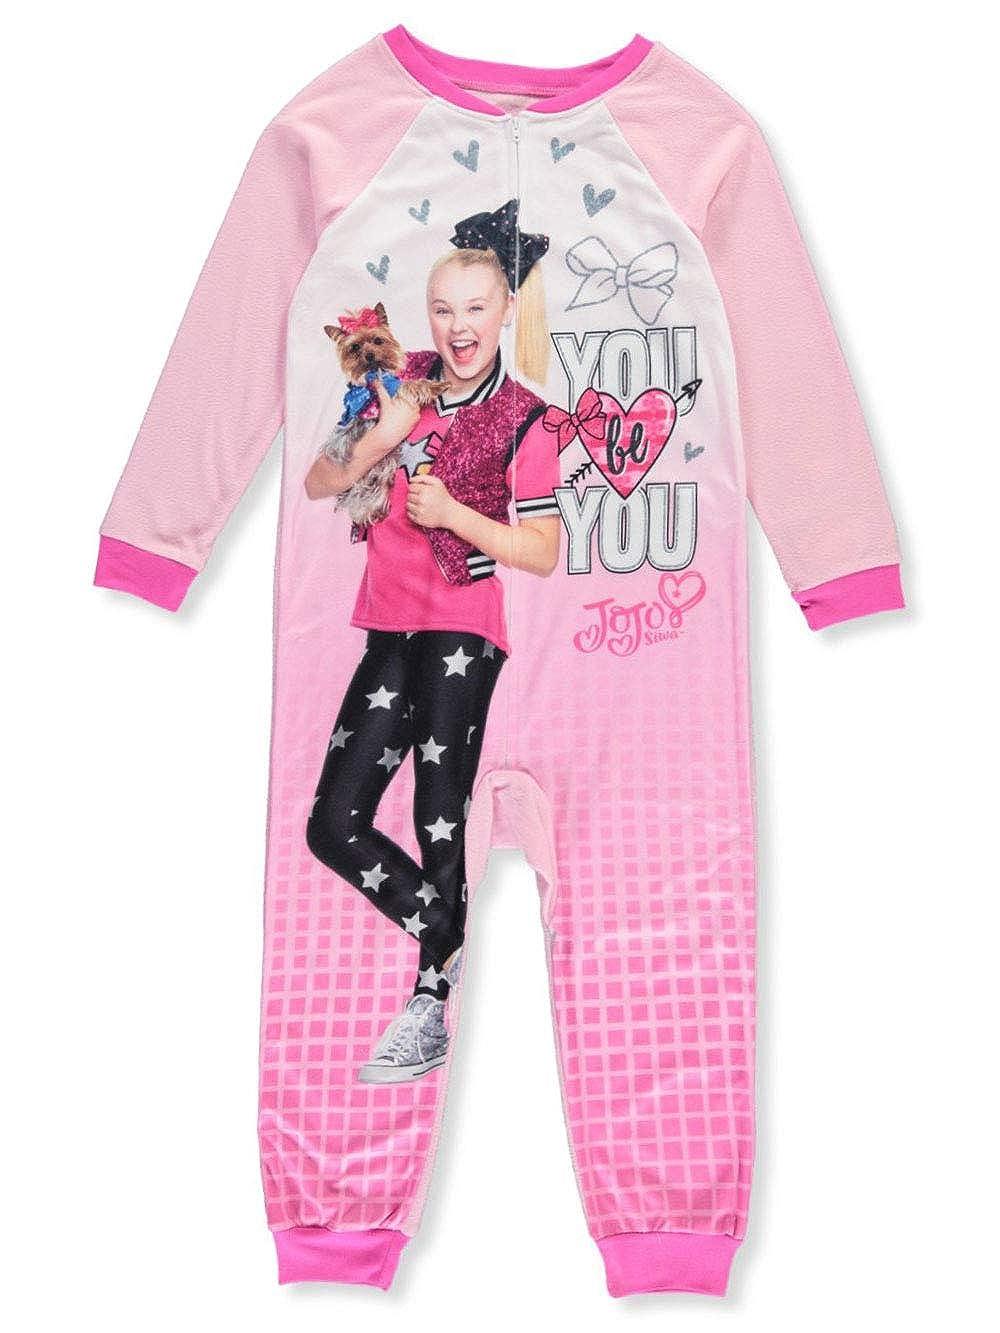 Nickelodeon Girls JoJo Siwa You Be You Blanket Sleeper